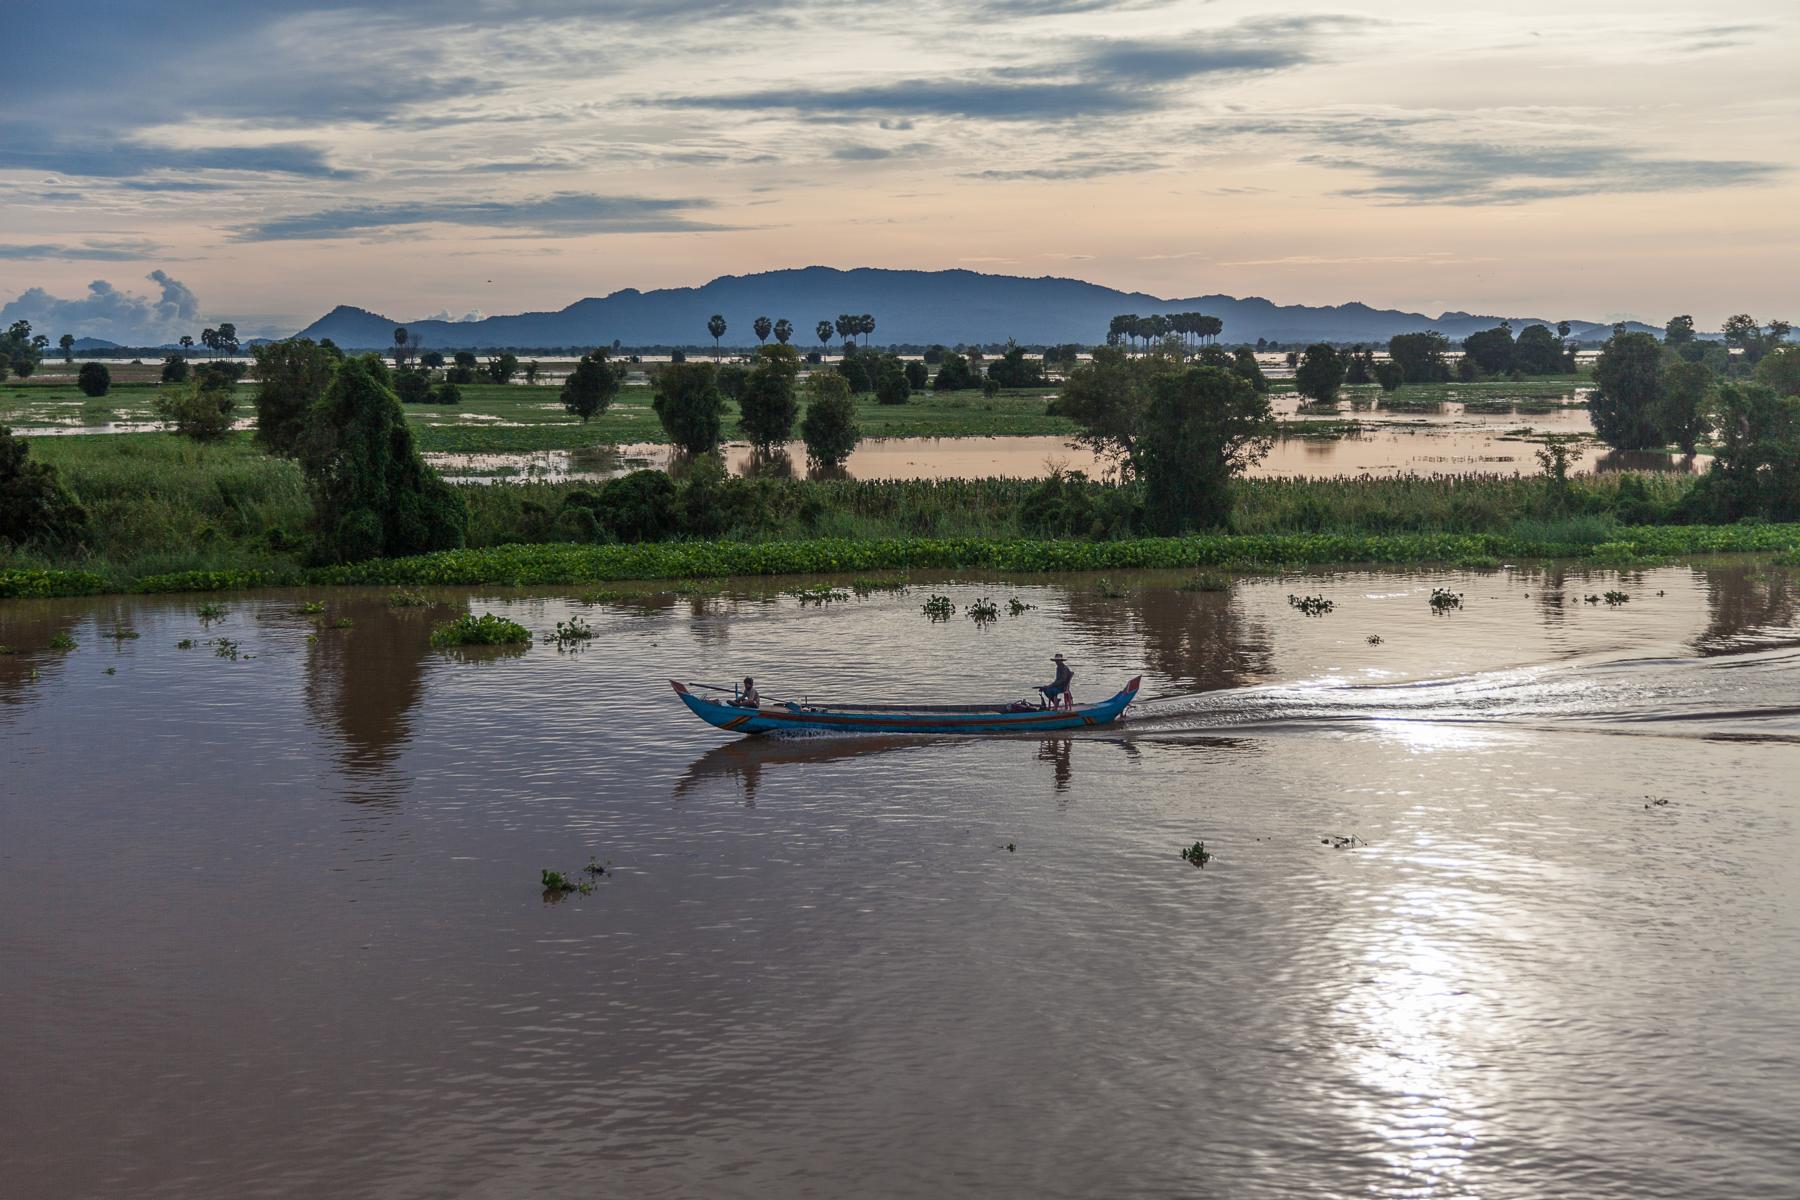 Lokales Boot auf dem Tonle Sap See in Kambodscha